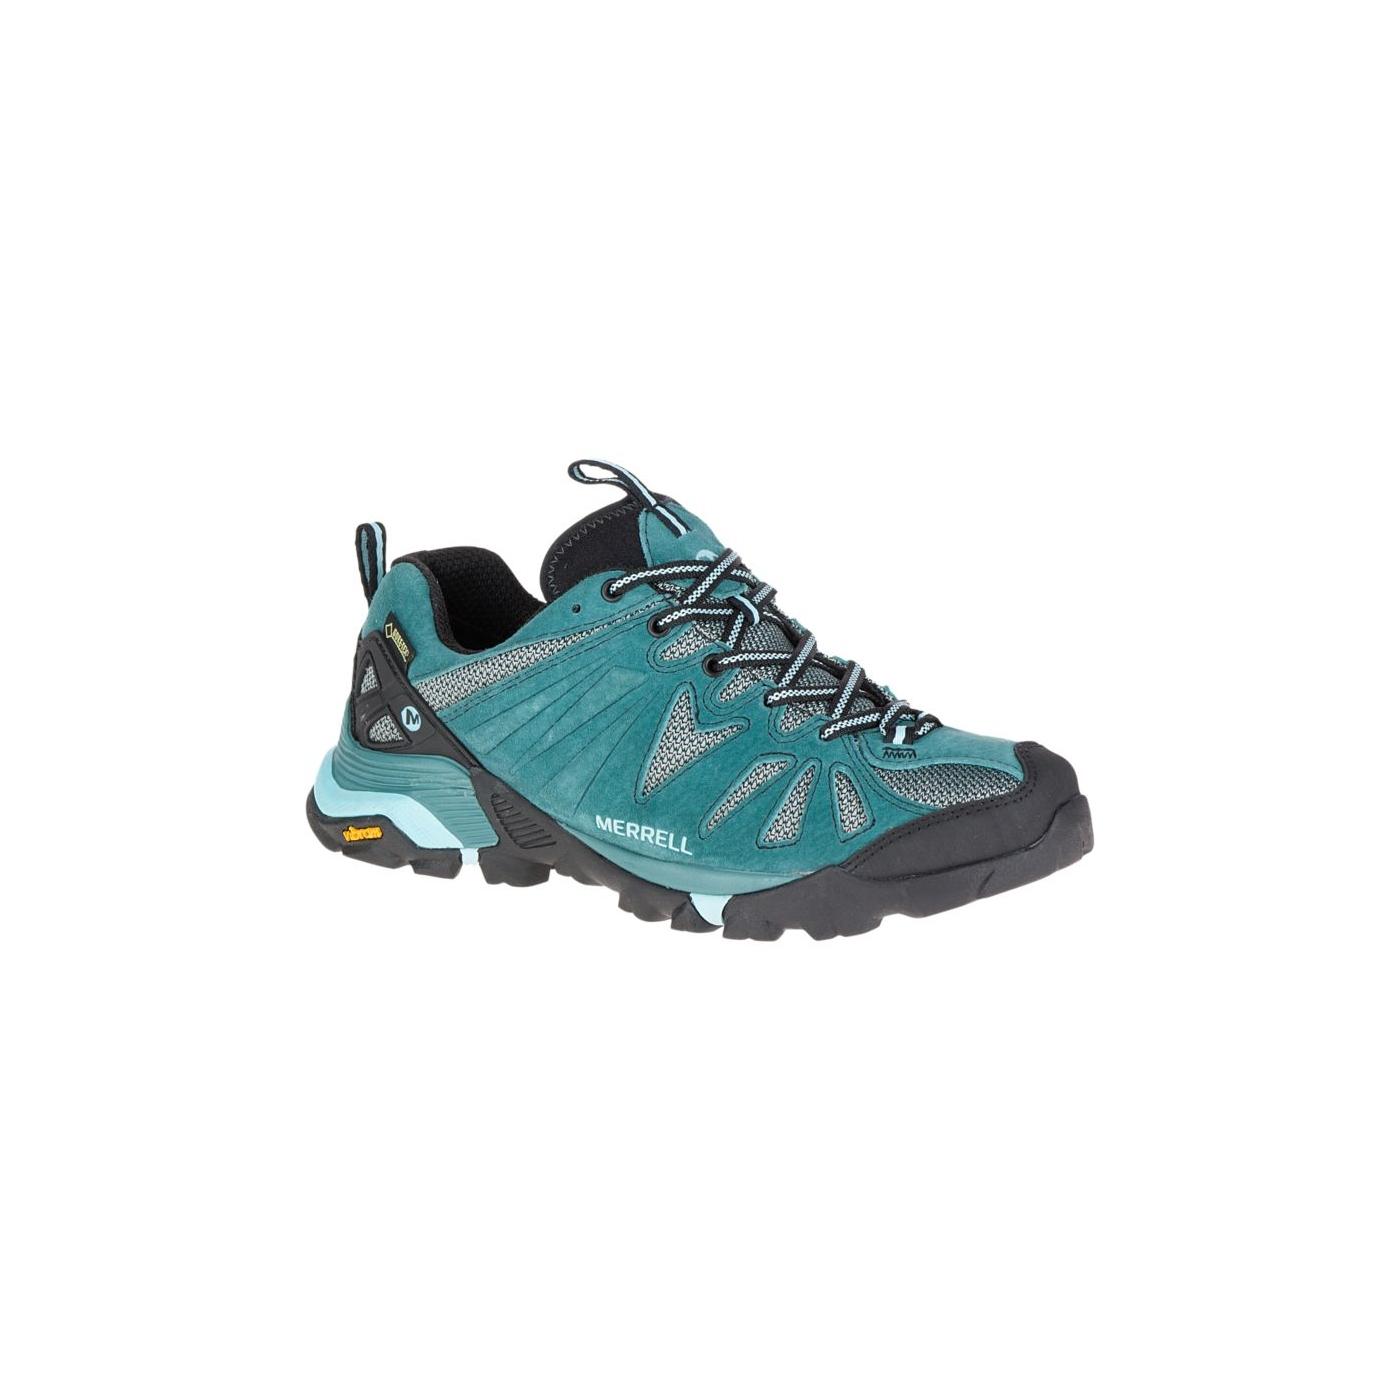 4305befb6c1 Chaussures Randonnée Merrell Capra Gtx Sea Pine